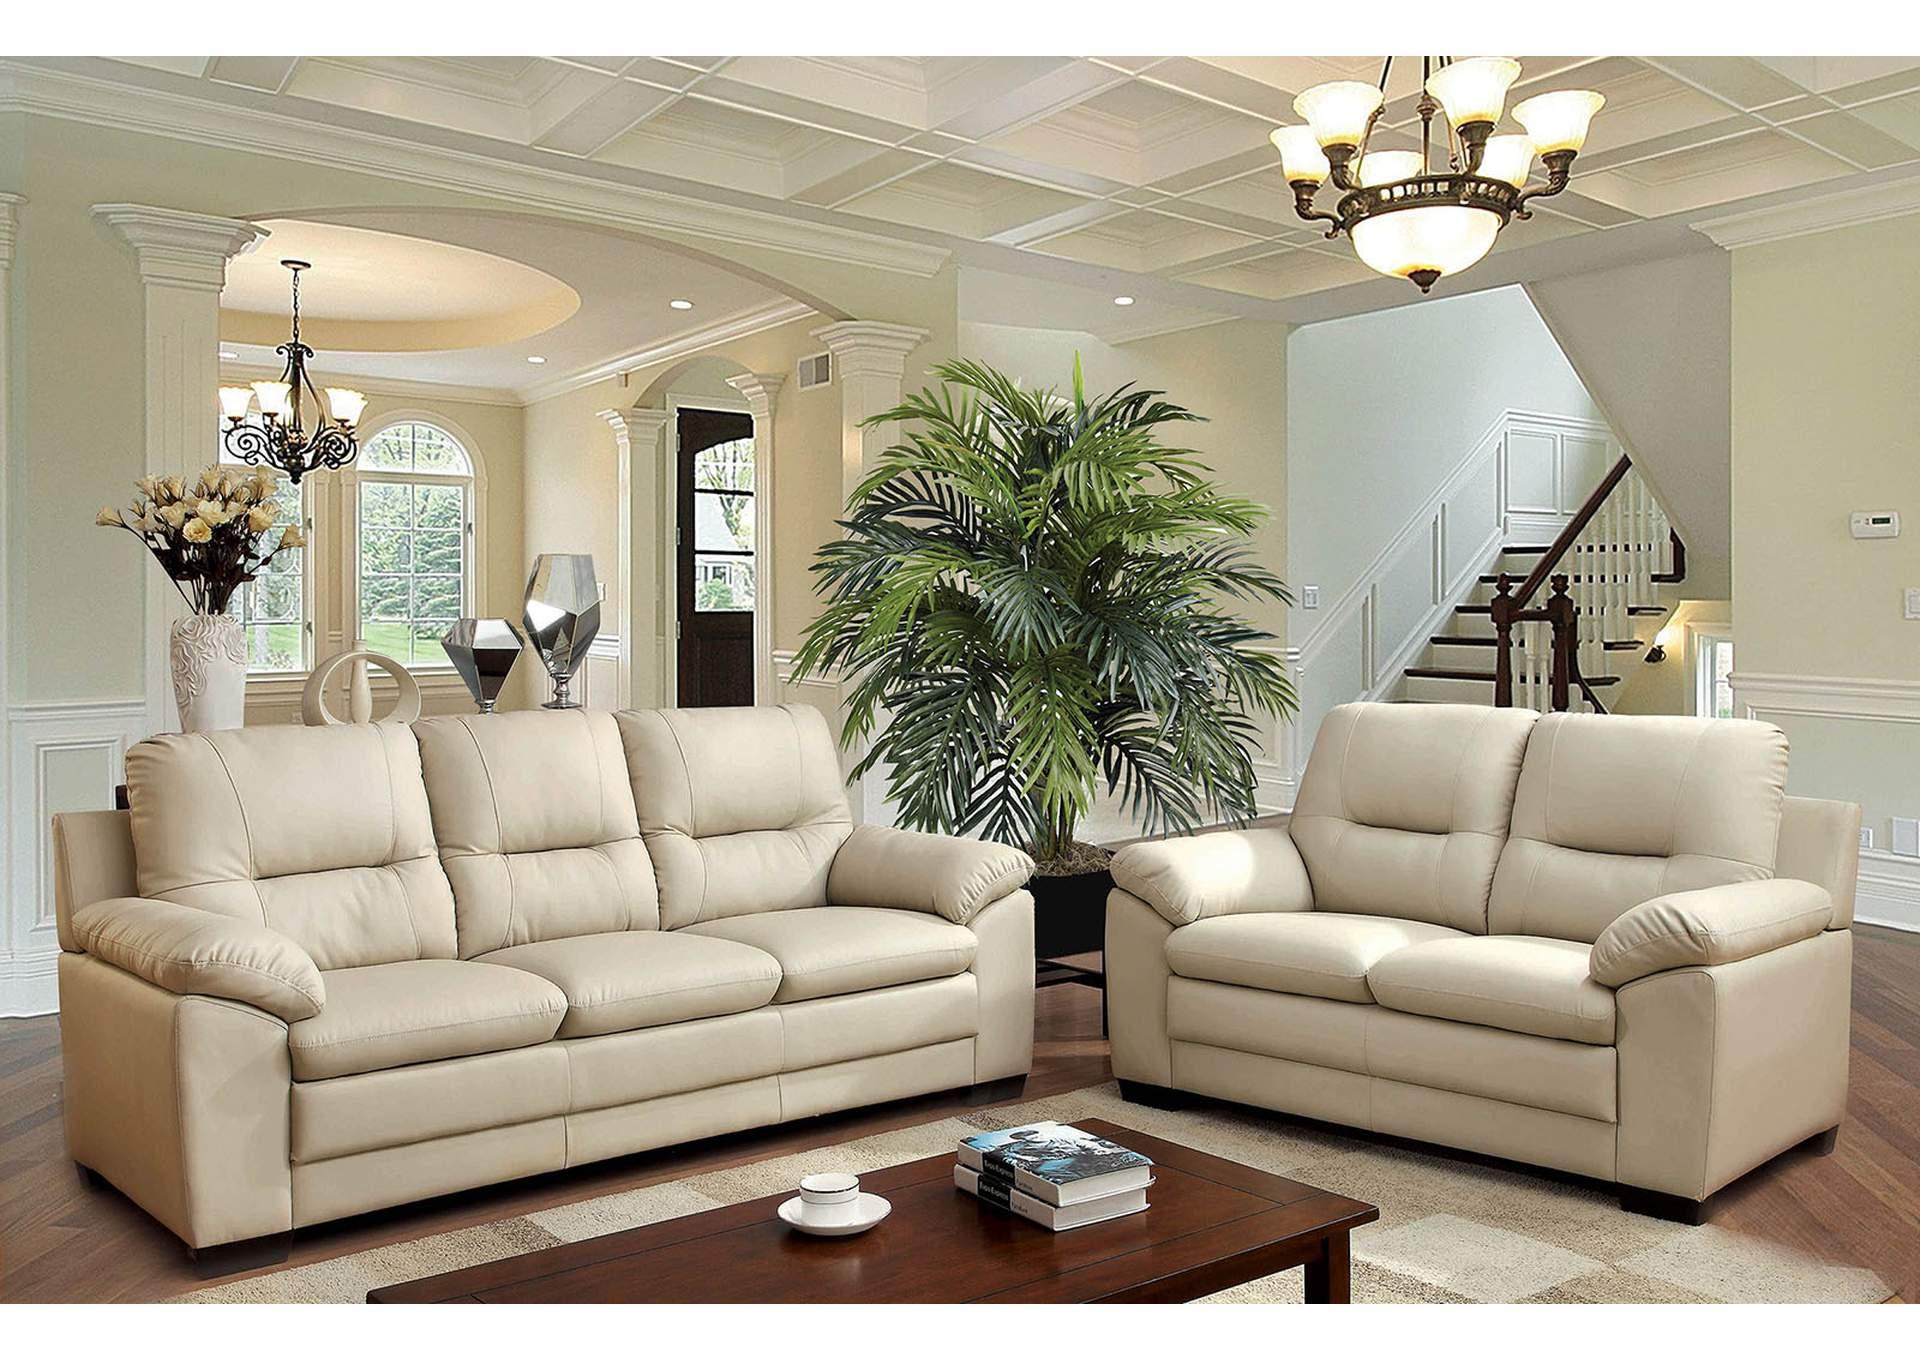 squan furniture parma ivory polyurethane sofa. Black Bedroom Furniture Sets. Home Design Ideas